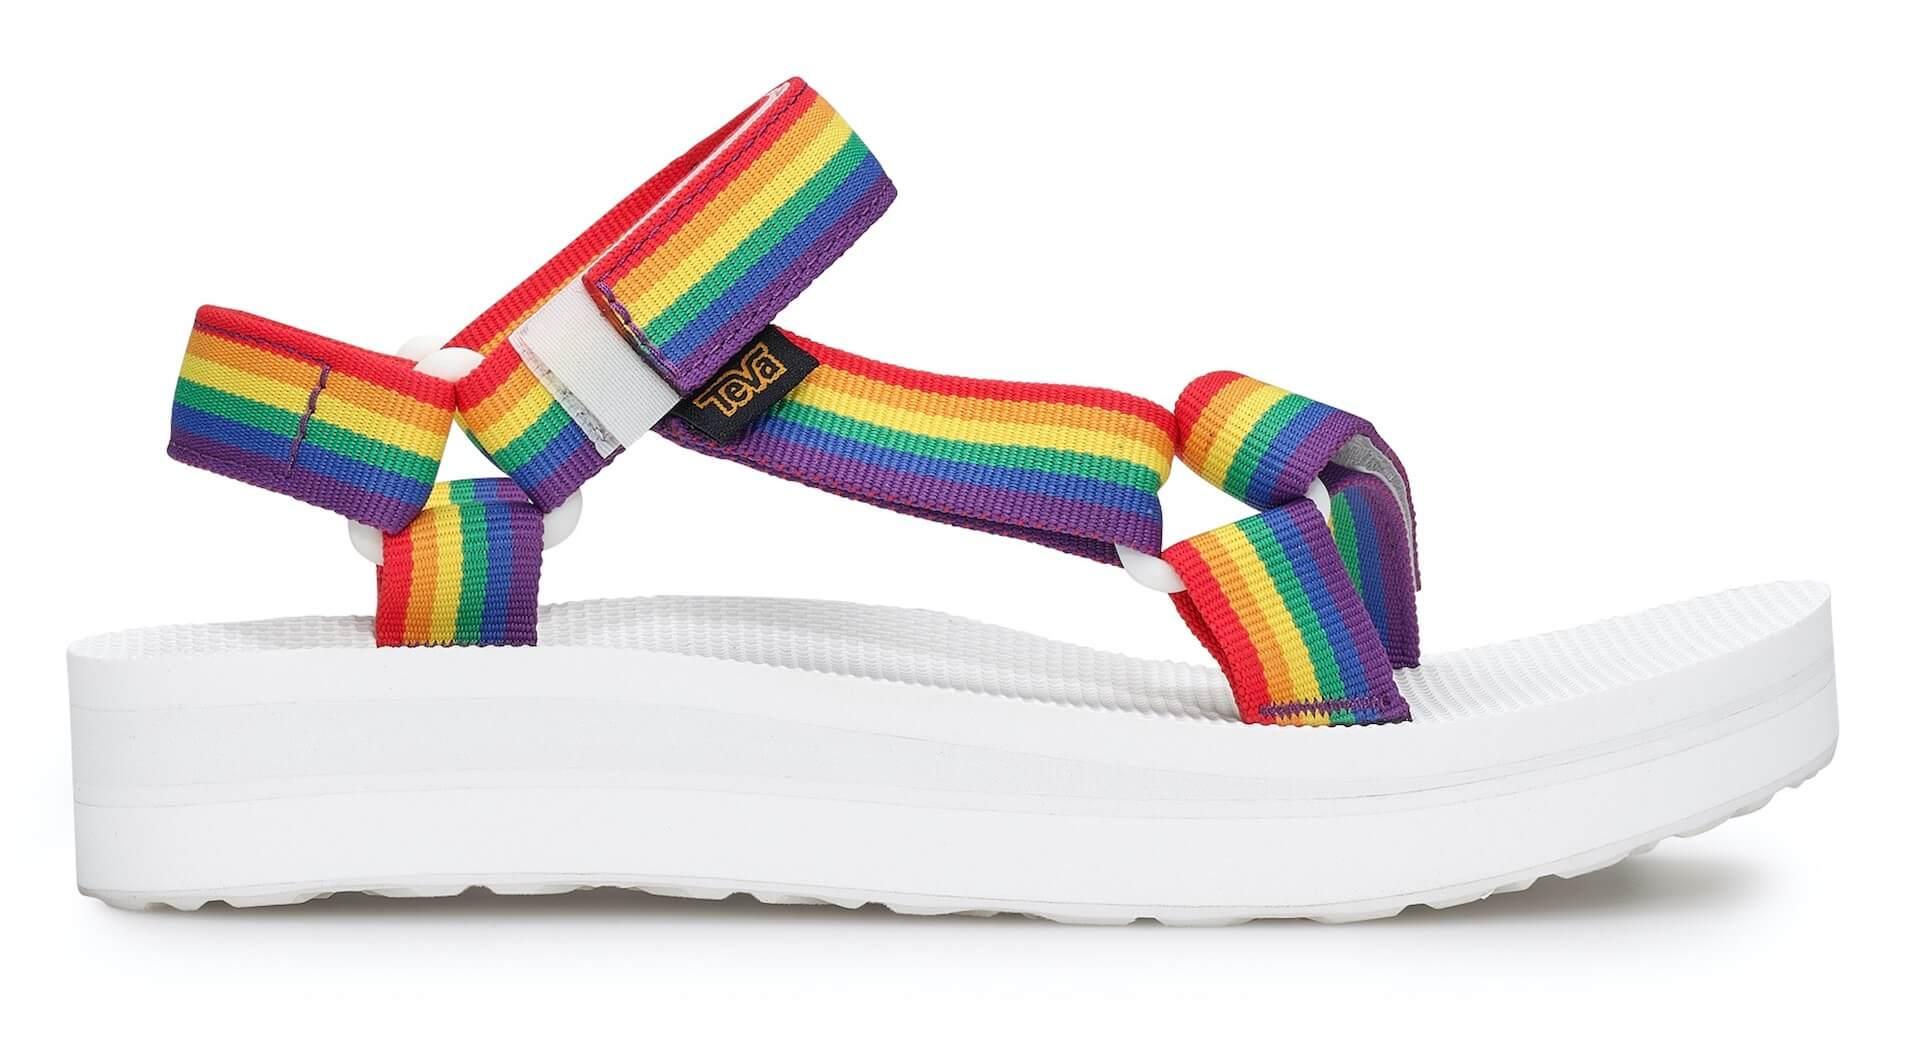 Tevaから、LGBTQ+支援団体「It Gets Better Project」記念サンダル登場!レインボーカラーの2種類 lf200421_teva_universal_14